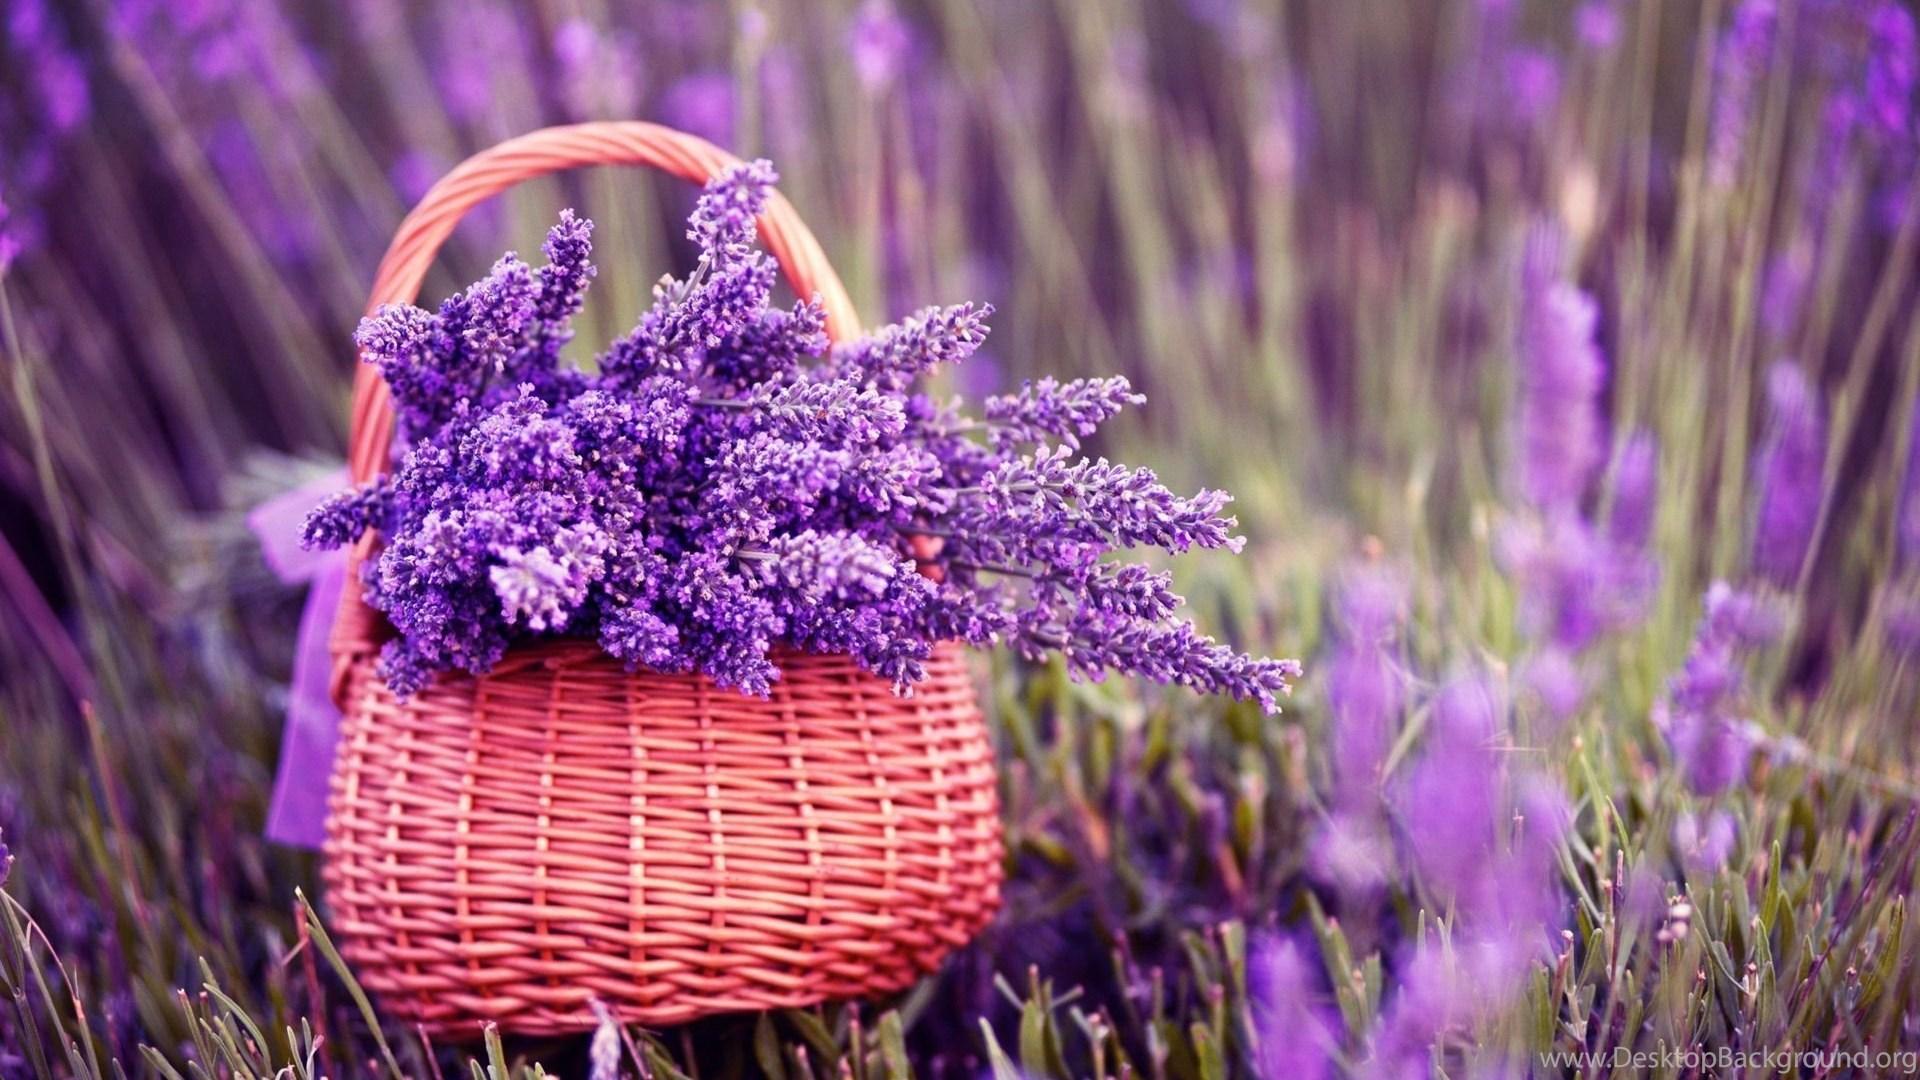 Purple lavender flower in basket wallpapers hd for desktop desktop background - Lavender purple wallpaper ...